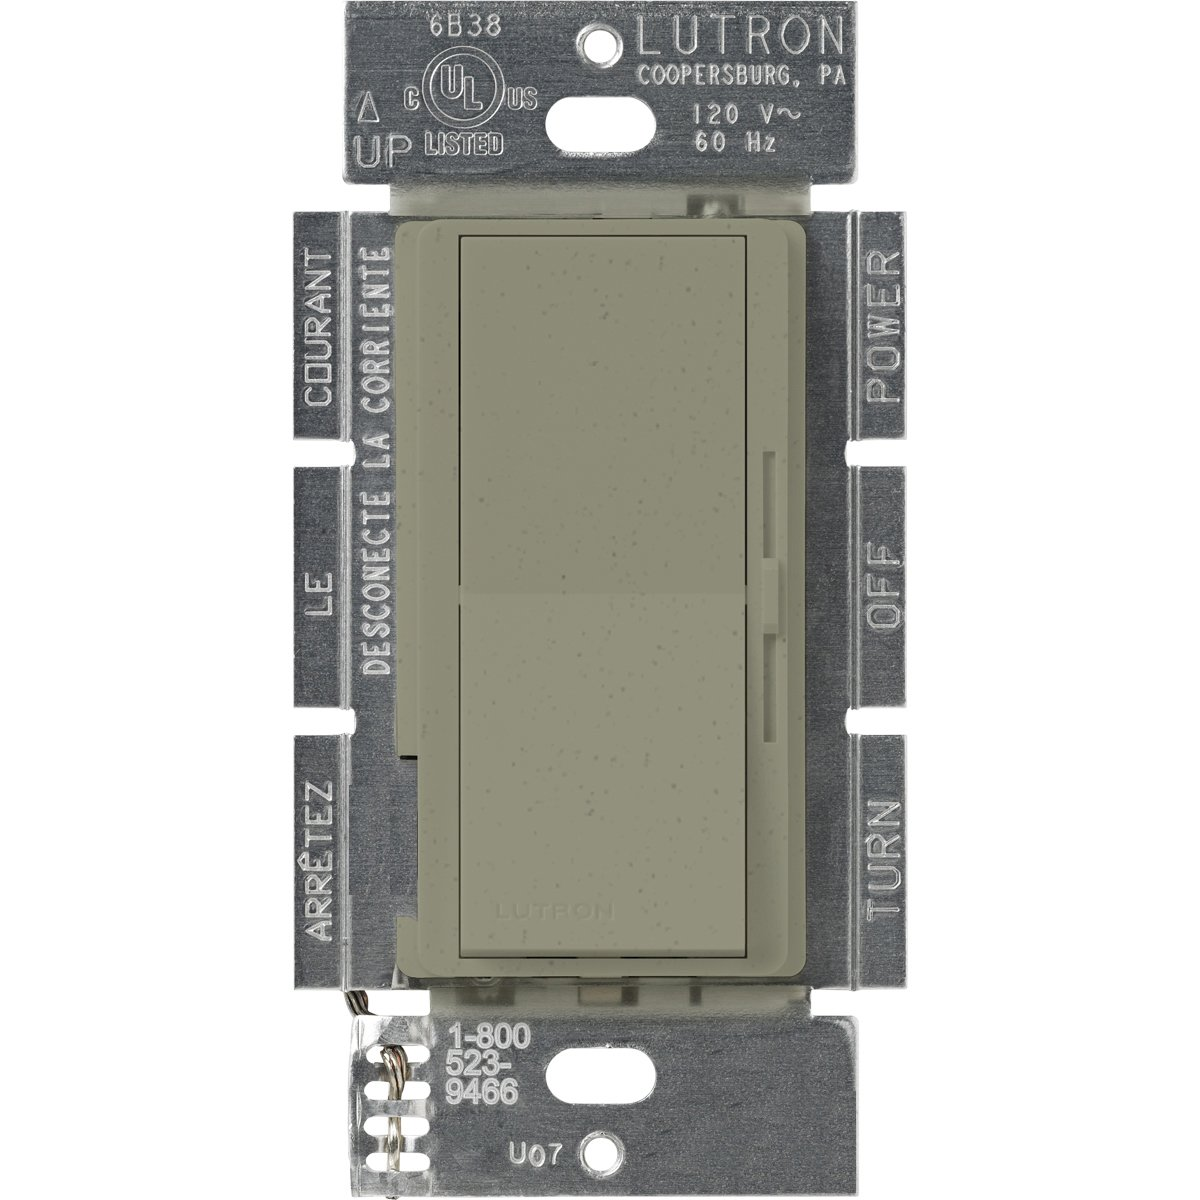 LUTRON(ルートロン) ディーバ 3段階変速ファンコントローラ 1.5A 単極3投 DVSCFSQ-F-GB 1 B000MAQ1V0 Greenbriar Greenbriar